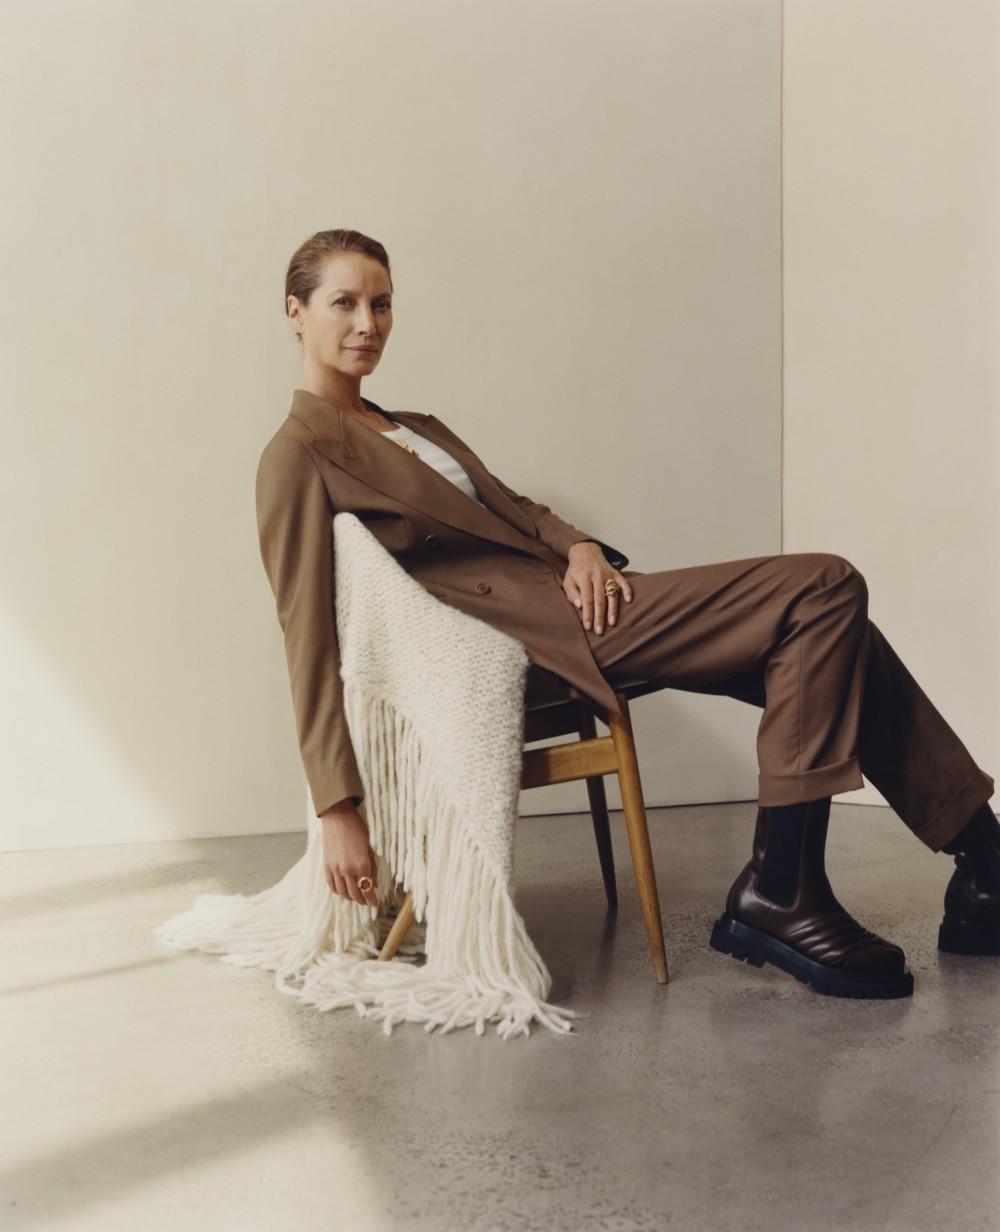 Christy Turlington Burns shows us how to dress like a gentlewoman